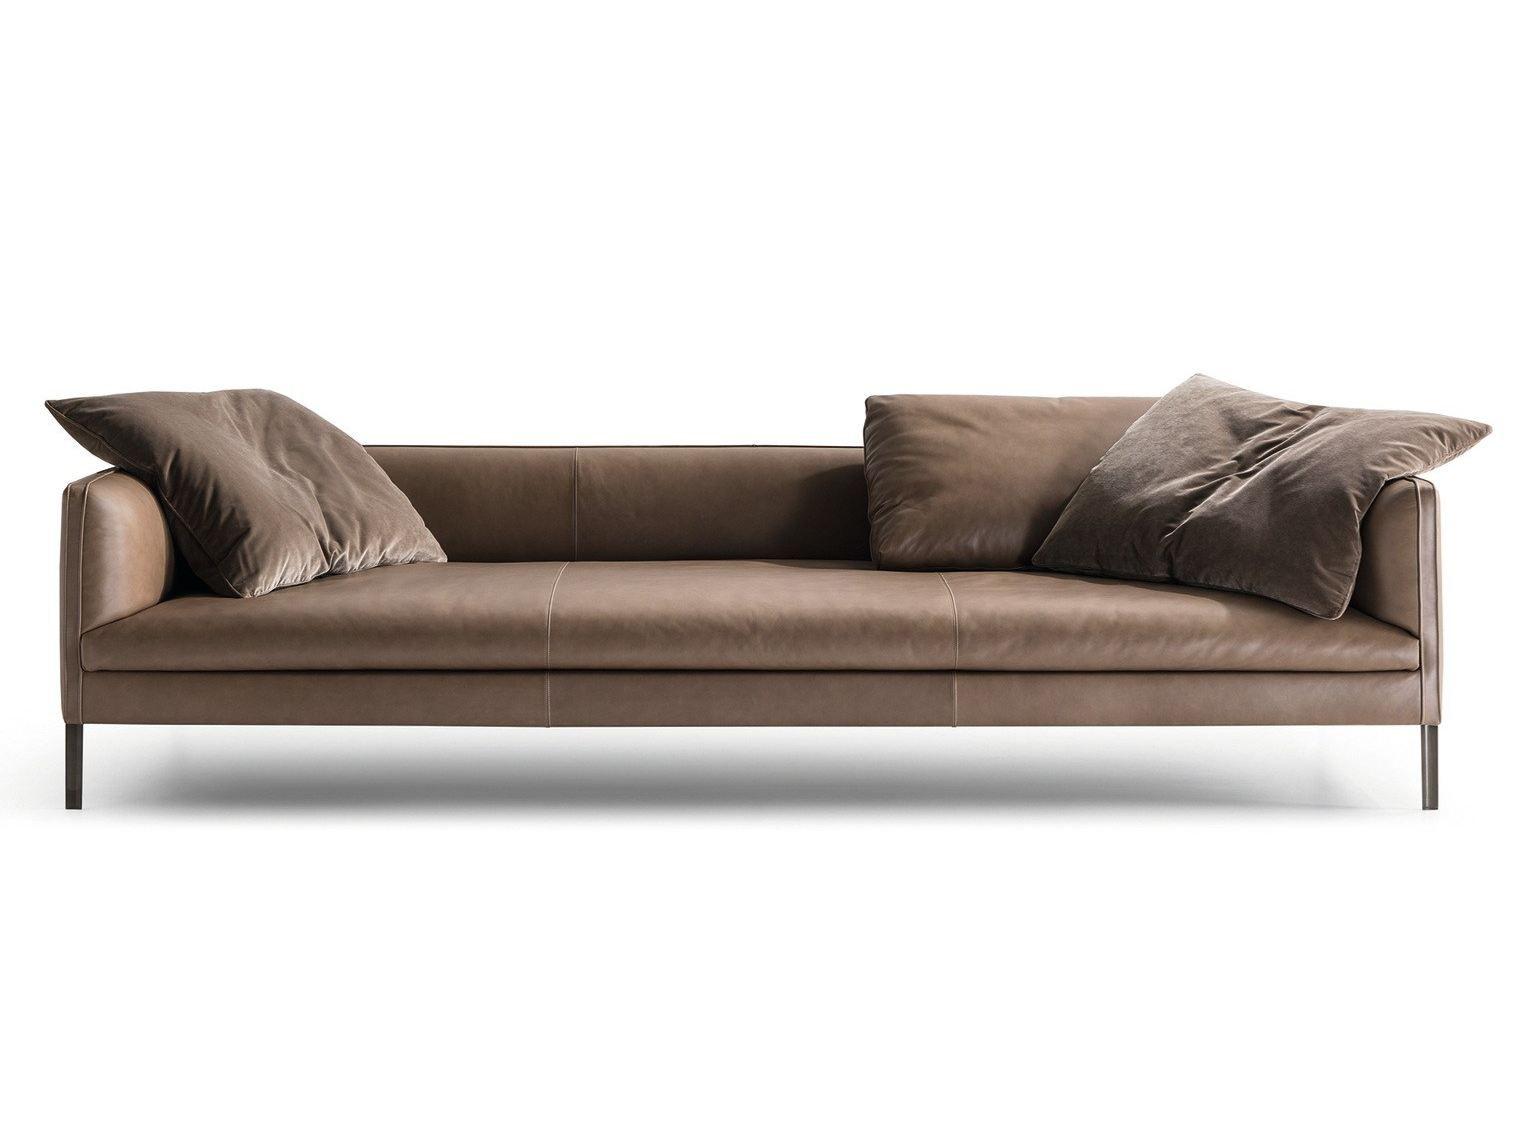 3 seater leather sofa PAUL | Sofa - MOLTENI & C. | Sofas | Pinterest ...